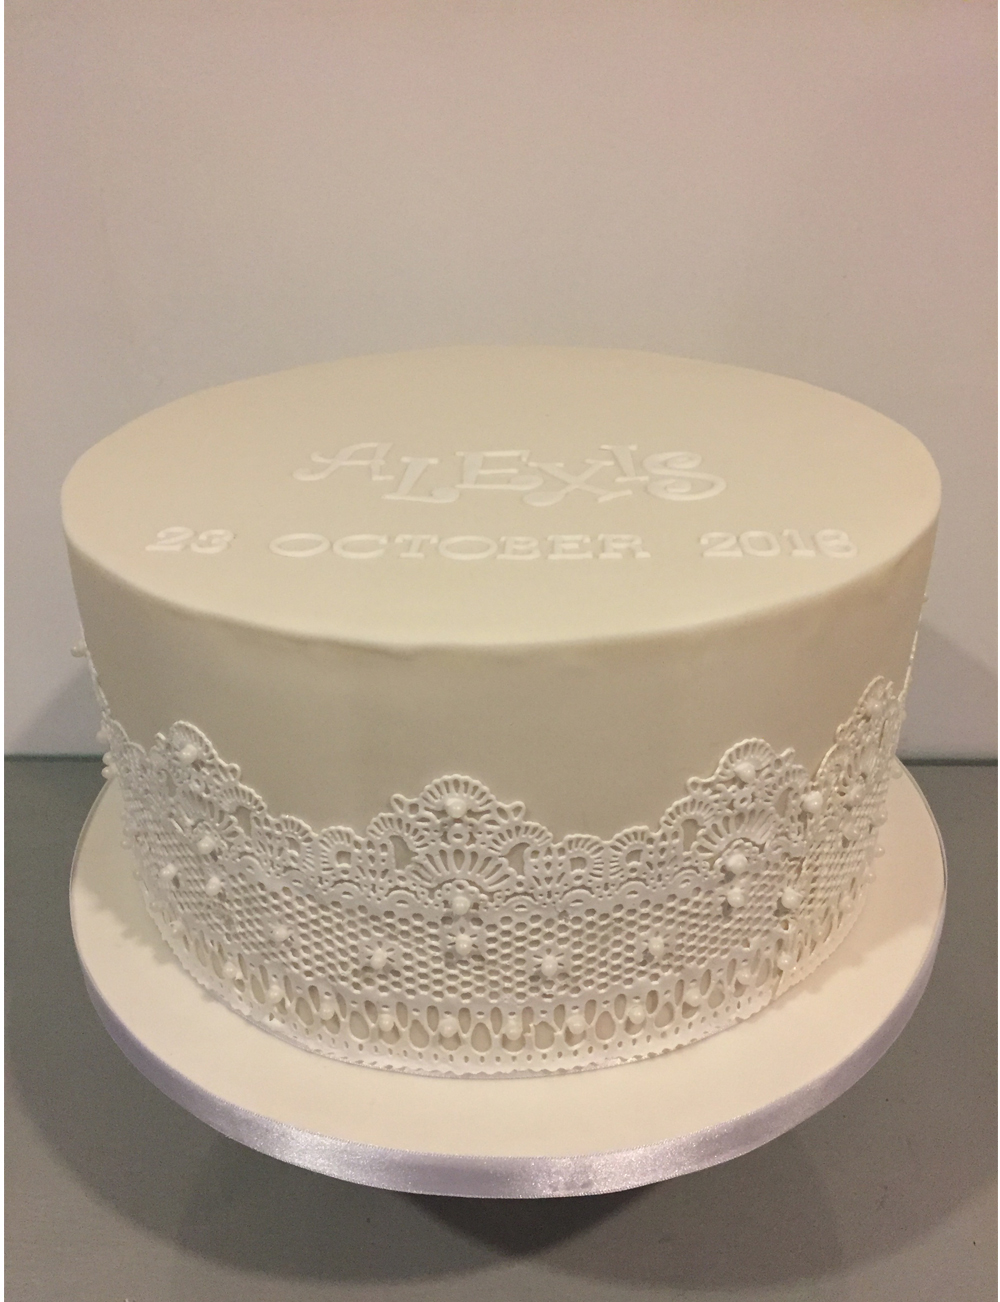 Dolce Lusso Cakes christening celebration cake